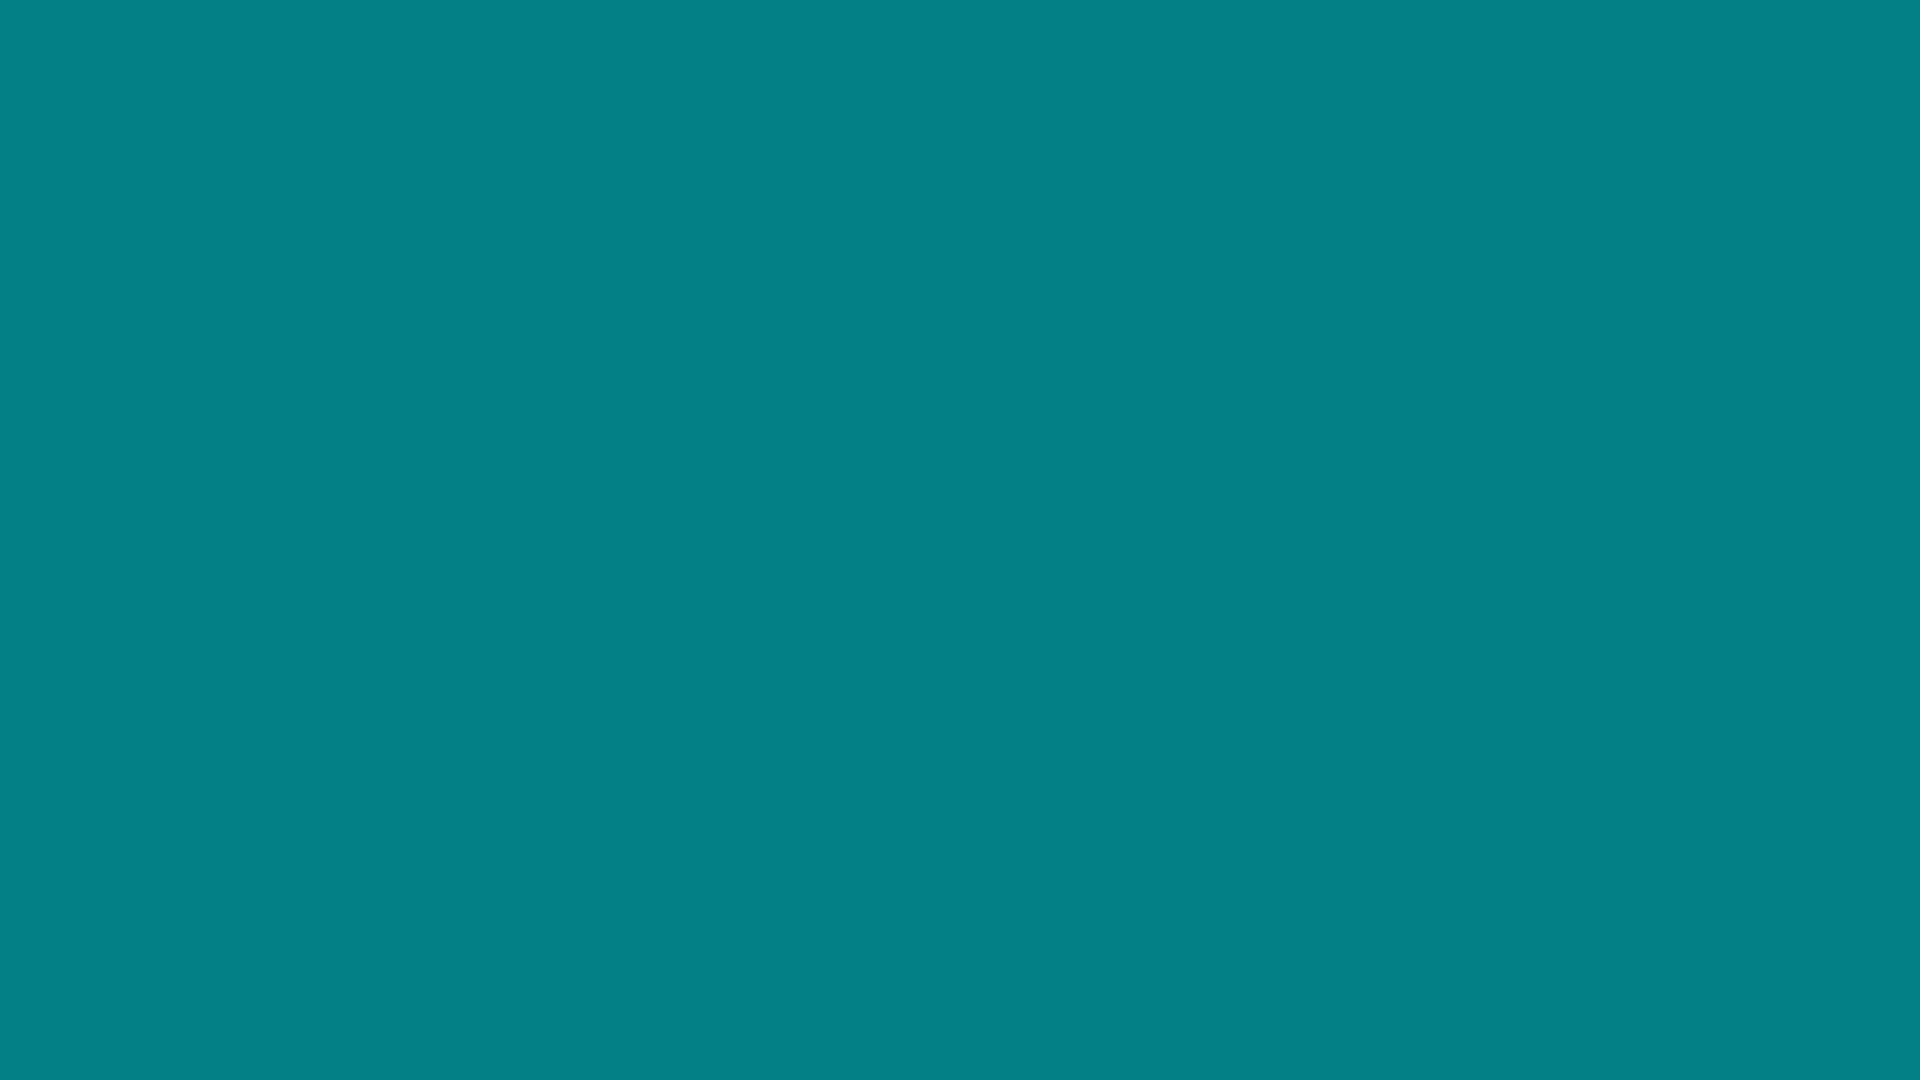 16 Luxury Pubg Wallpaper Iphone 6: Windows 95 Default Wallpaper [1920 X 1080]